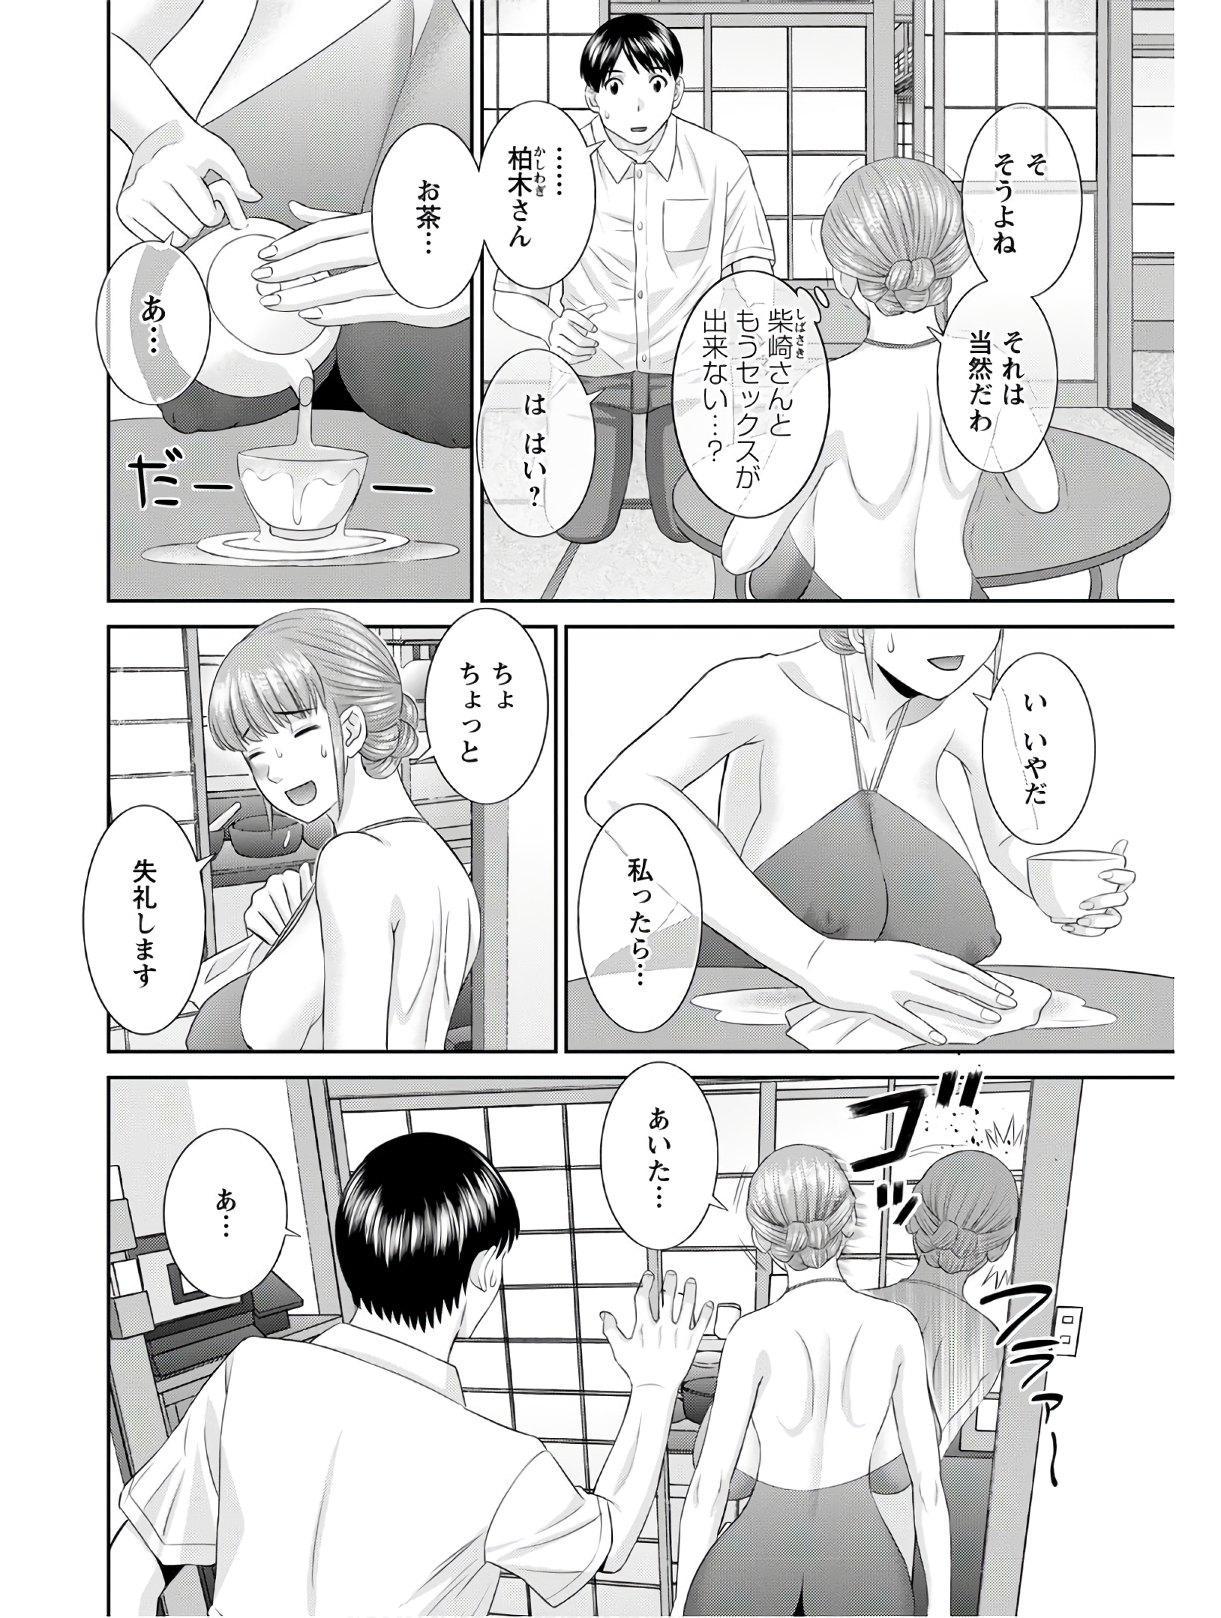 [Kawamori Misaki] Kaikan Hitotsuma Gakuen Ch. 1-6, 8-20 [Digital] 296